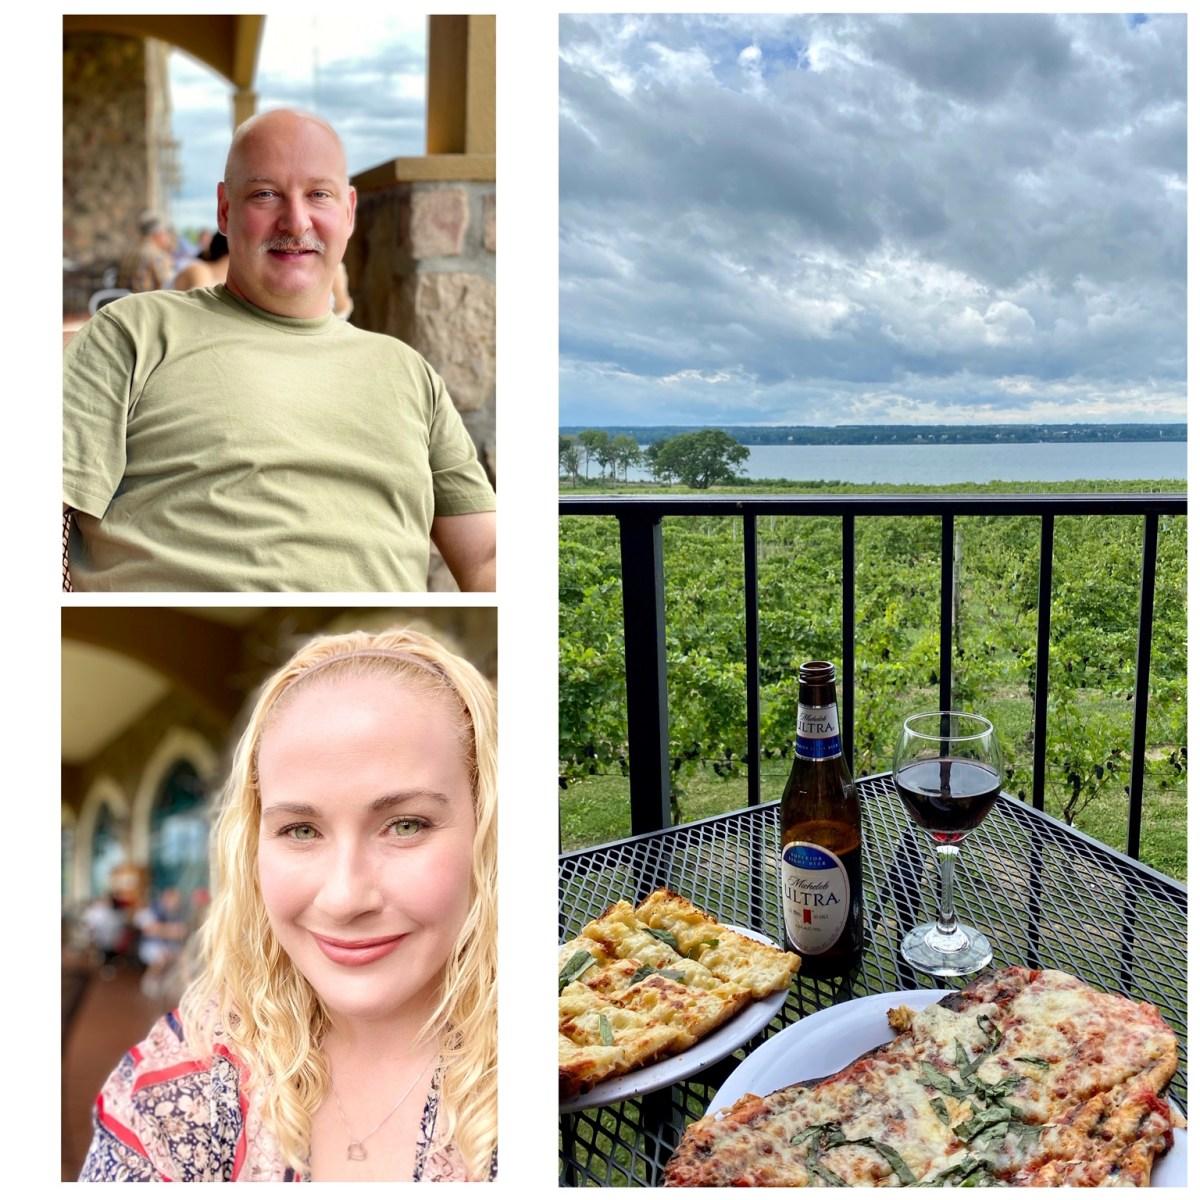 Ventosa Vineyards on Seneca Lake #ventosavineyards #senecalake #wheretoeatinthefingerlakes #senecalakewinery #senecalakewineries #senecalakewinetrail #fingerlakeswineries #fingerlakesny